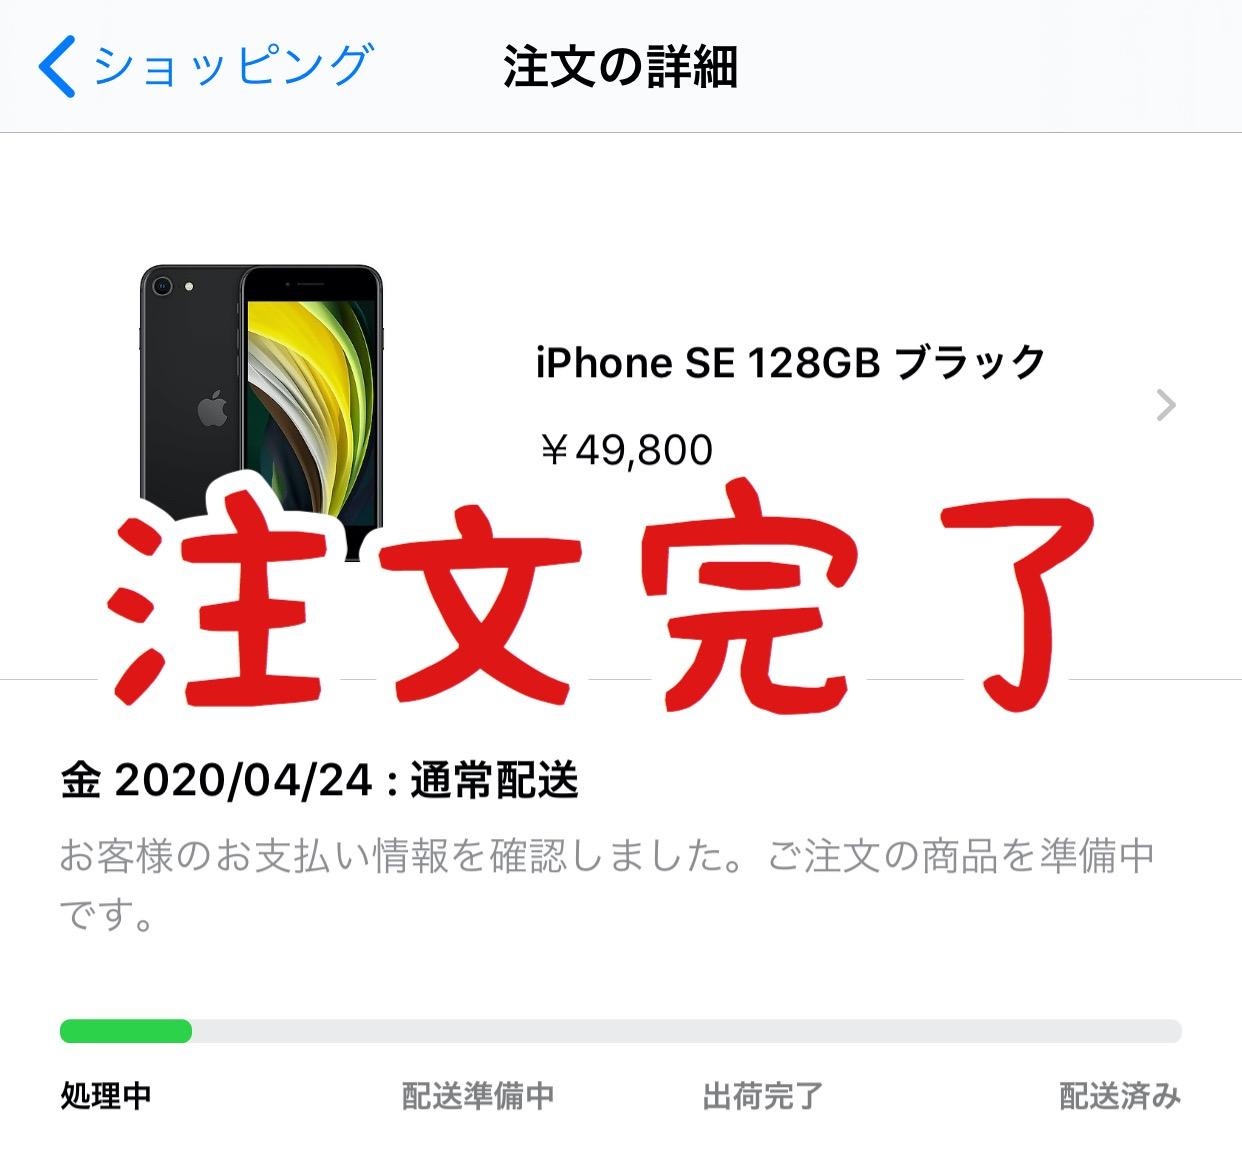 iPhone 7 Plusを下取りに「iPhone SE」を予約した